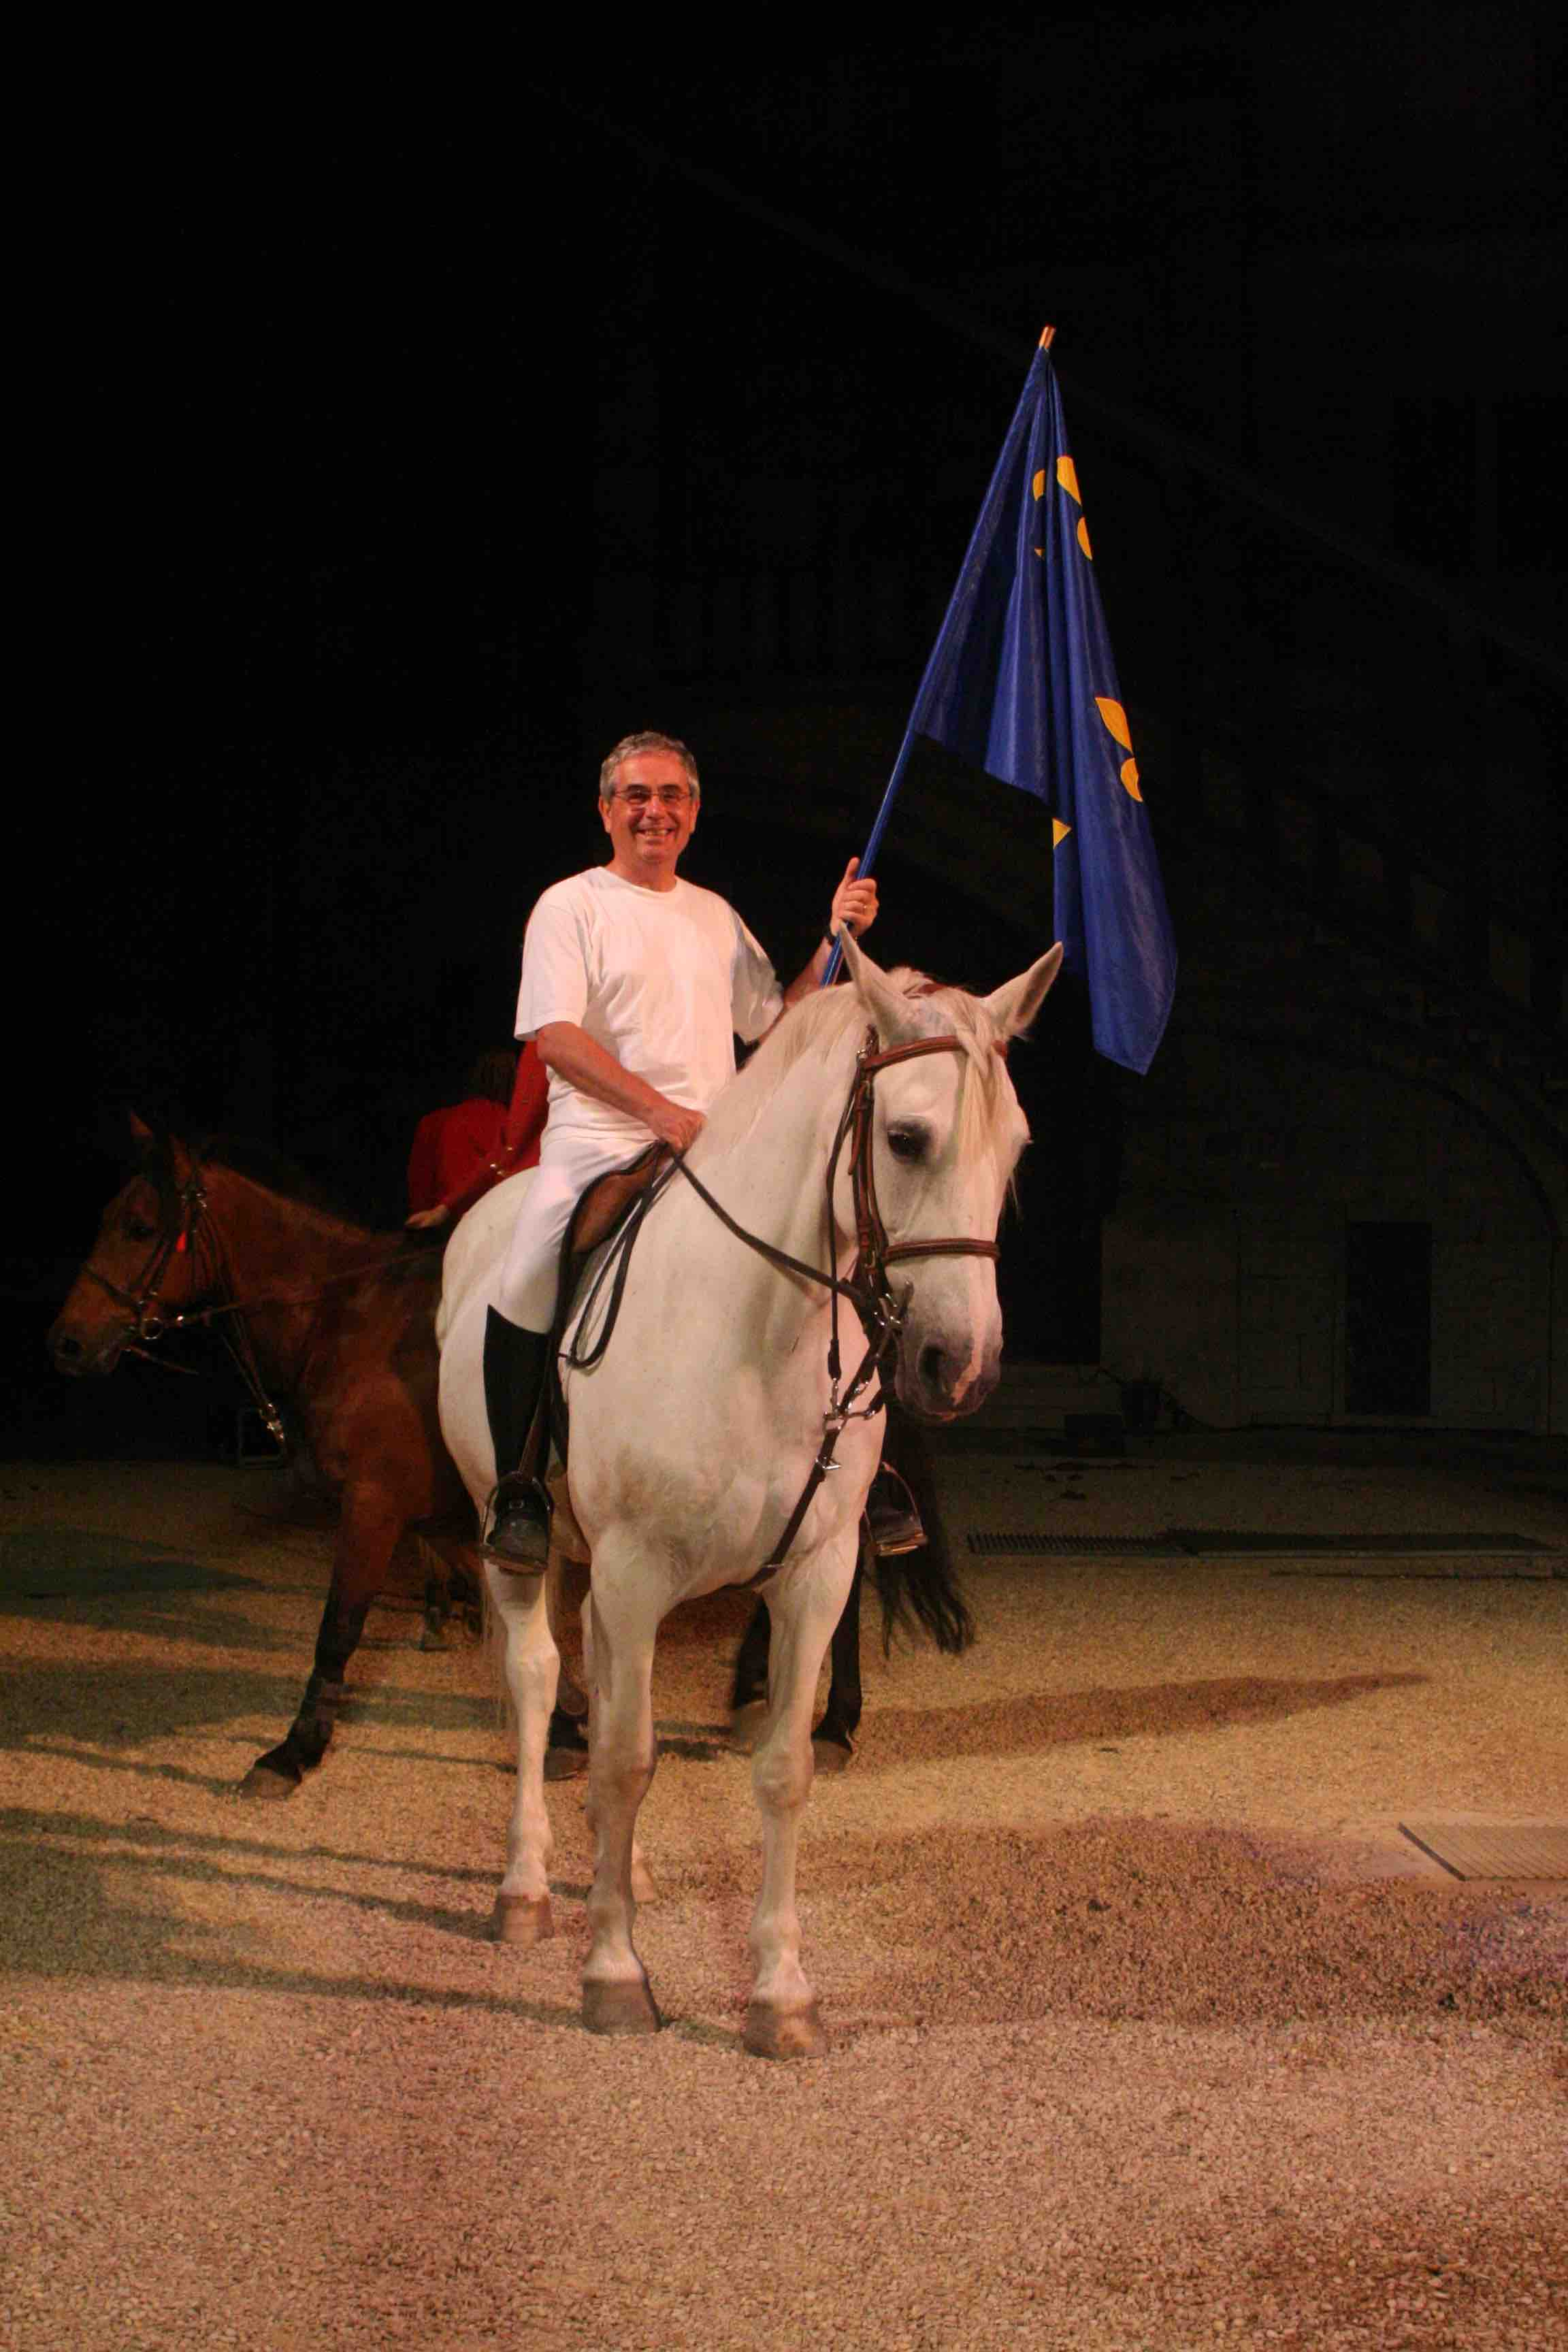 cheval, loisir, drapeau, blanc, chmeaux